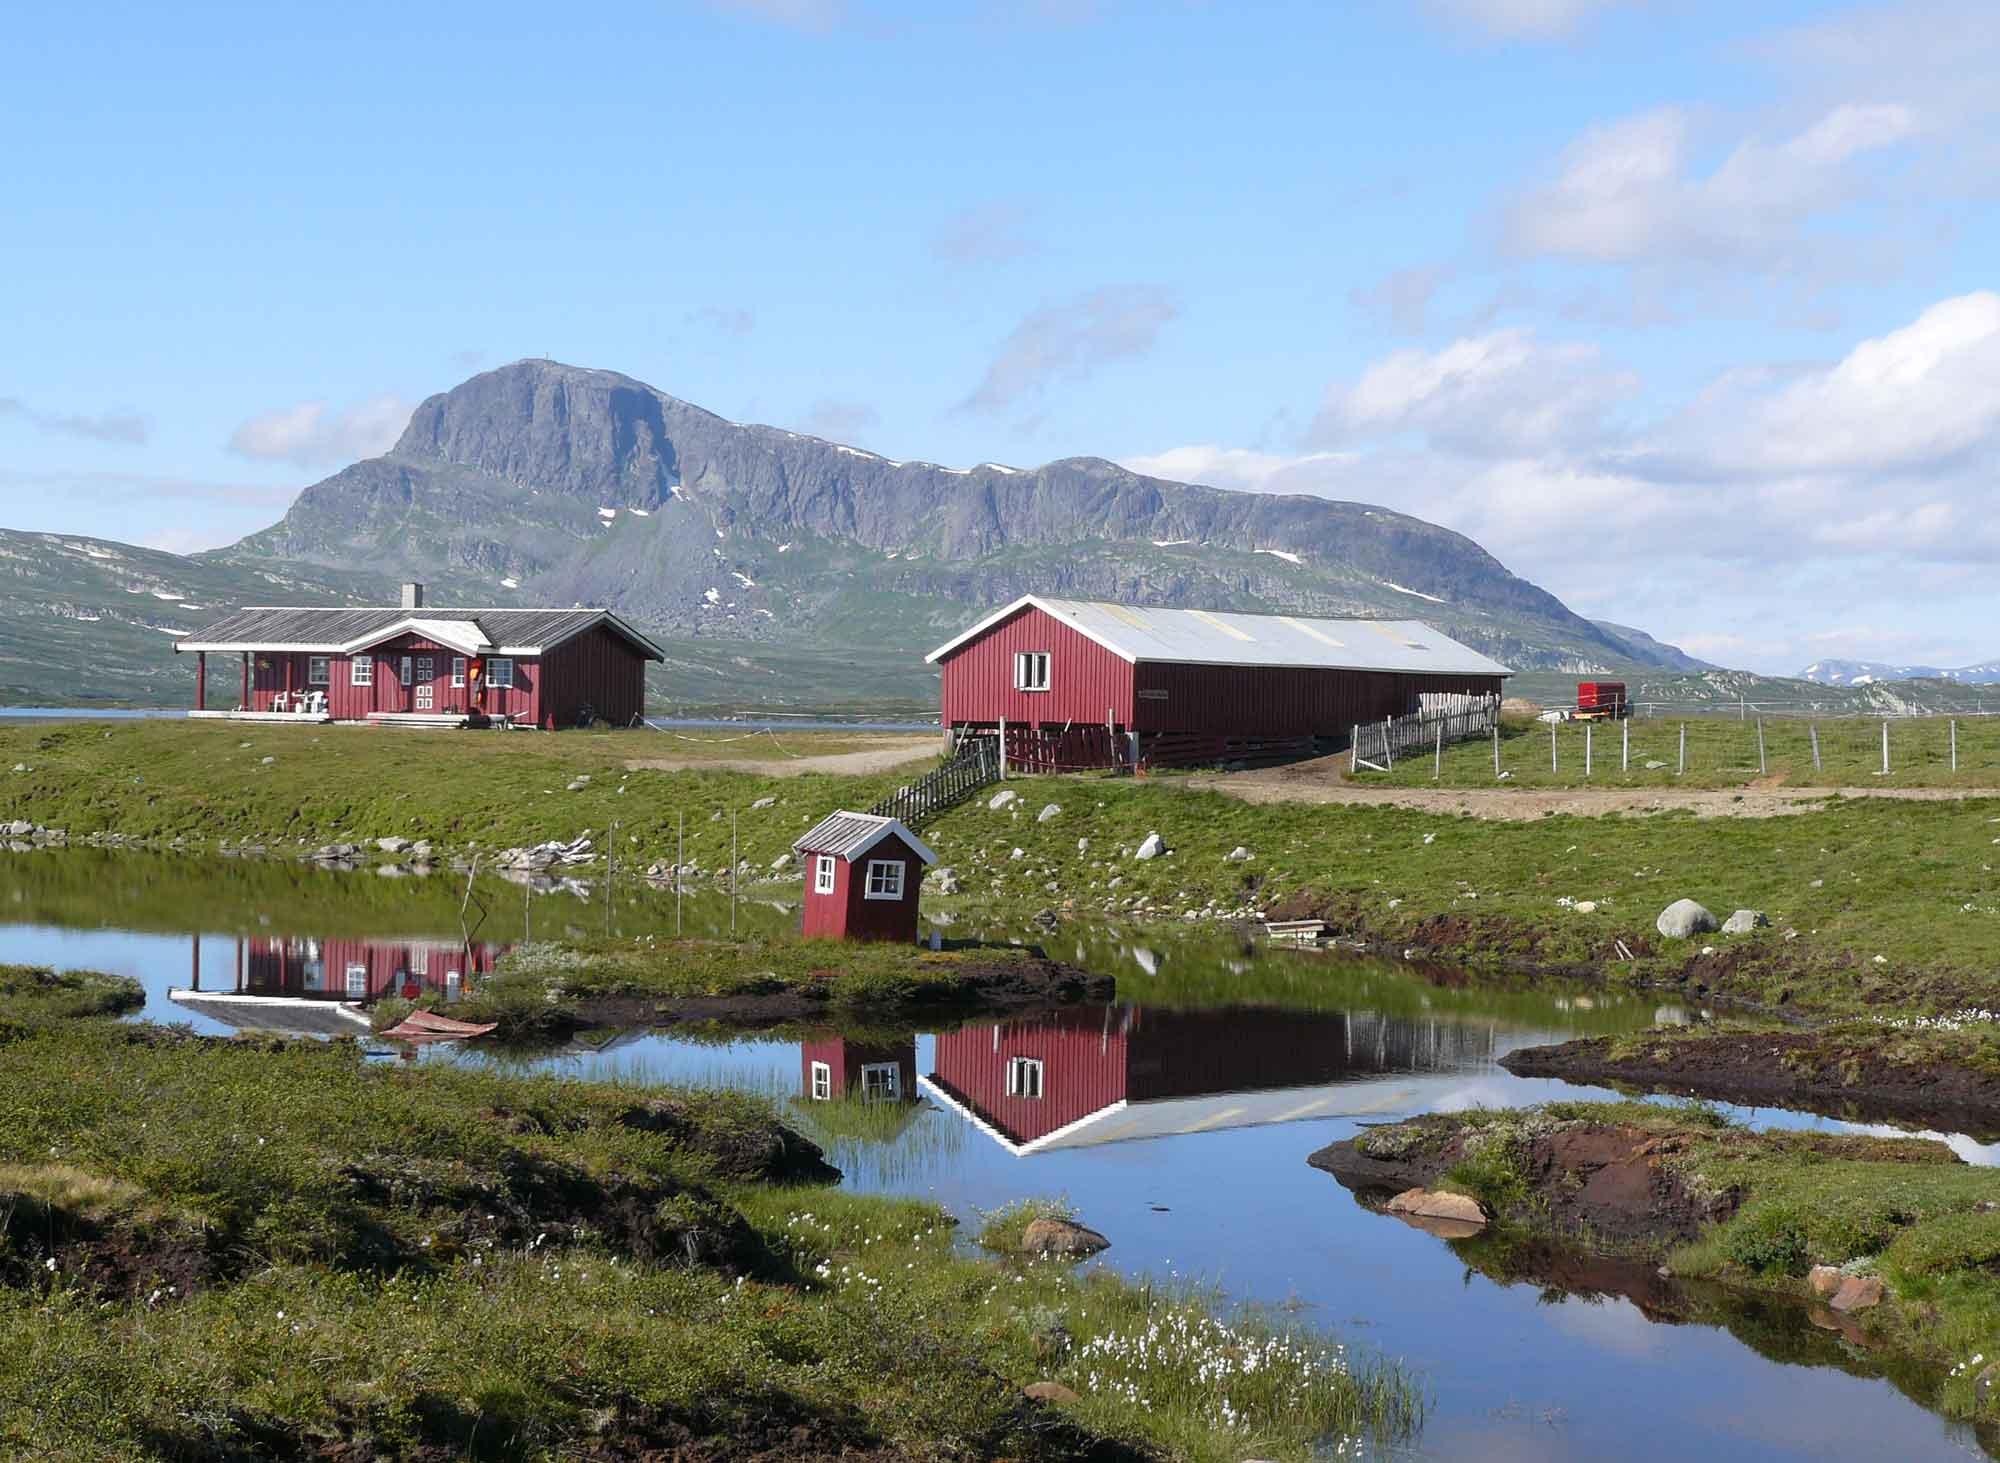 Mjølkevegen langs de zomerboerderijen van Espedalen